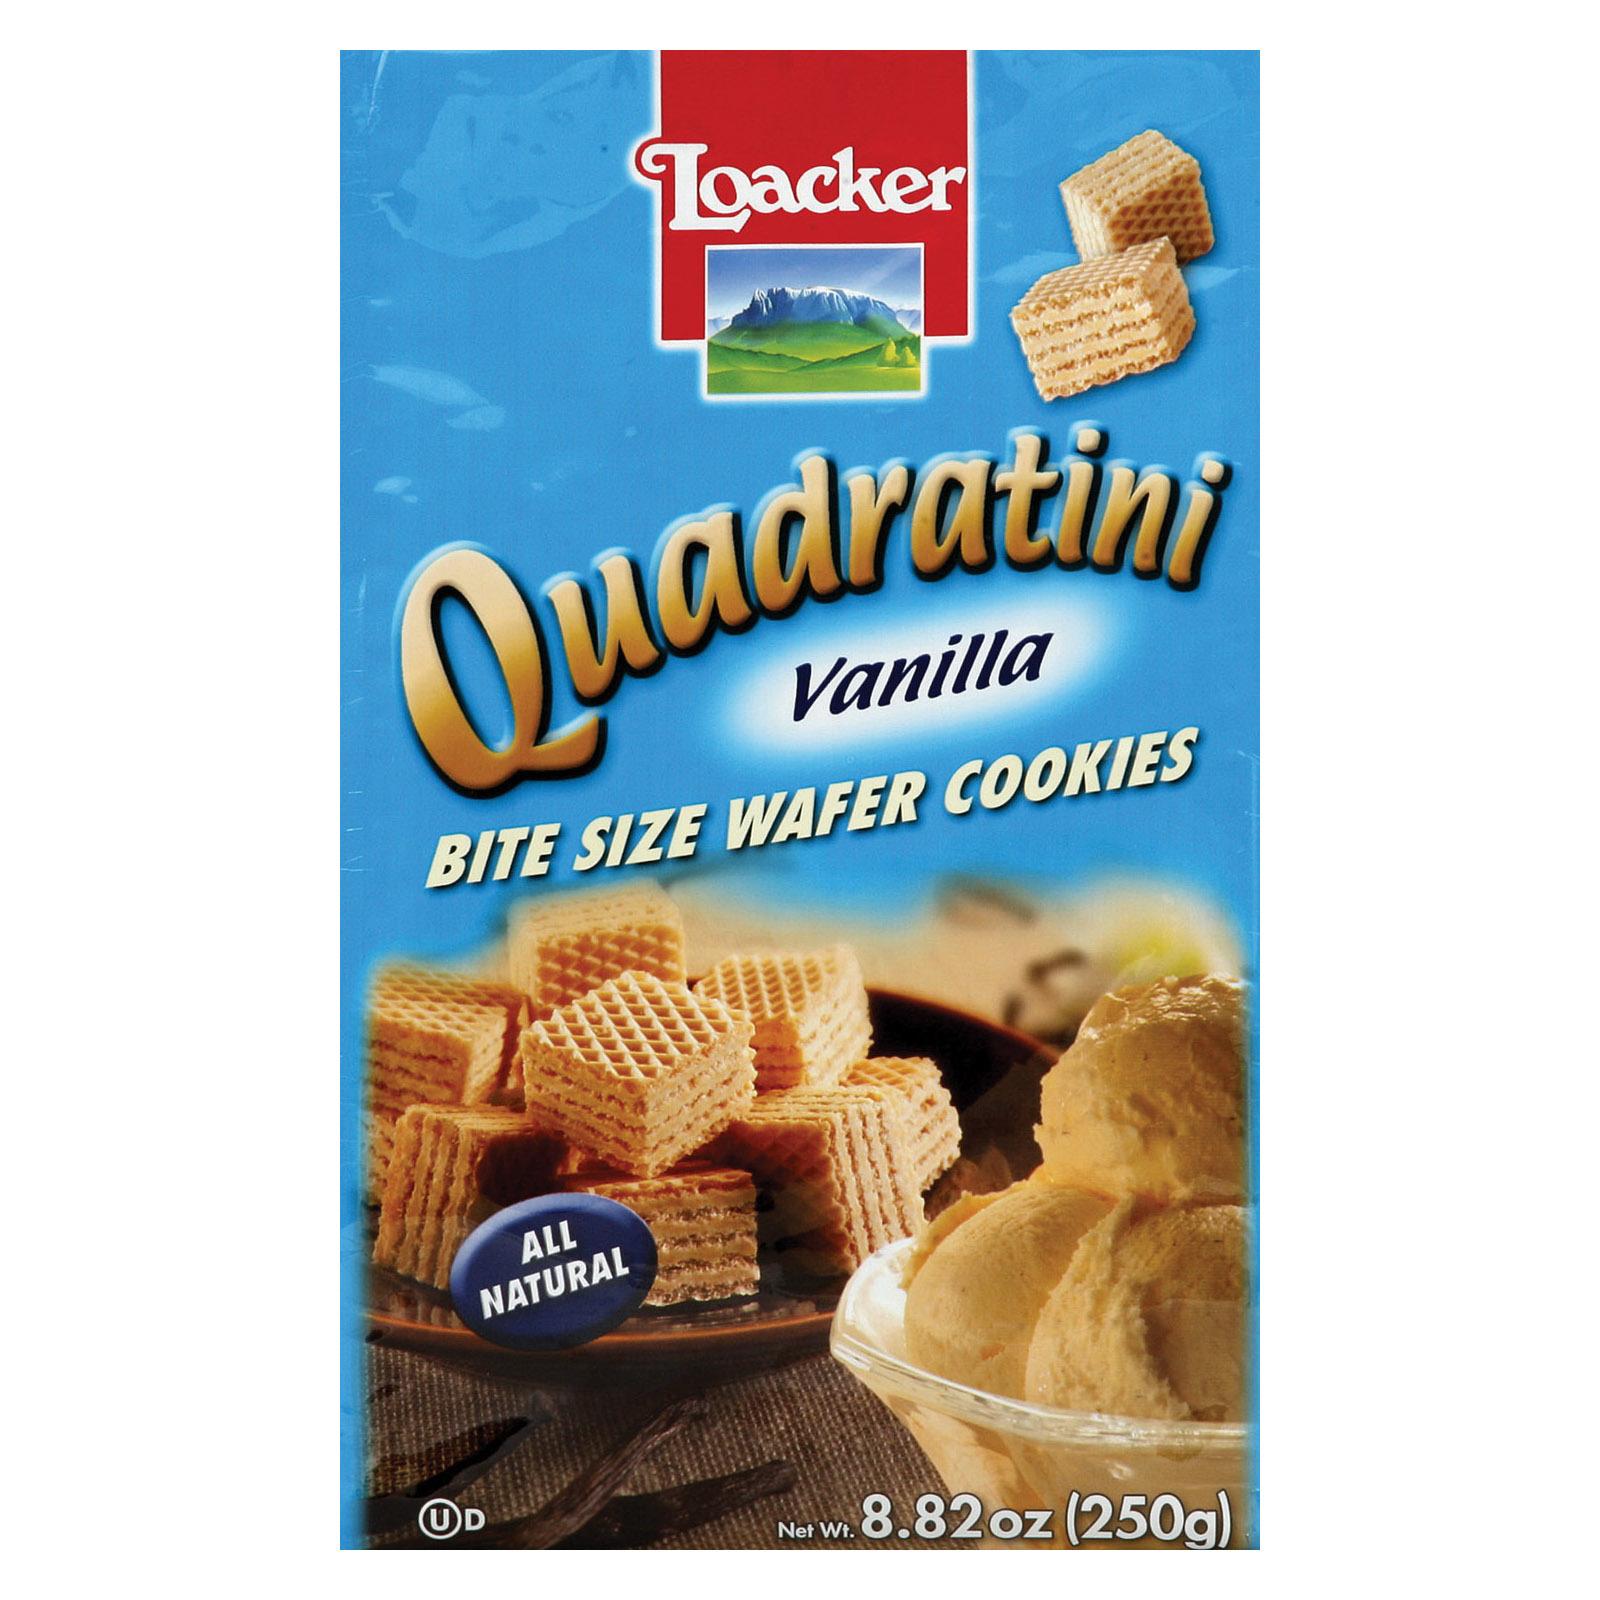 Loacker Quadratini Vanilla Bite Size Wafer Cookies - Case of 8 - 8.82 oz.